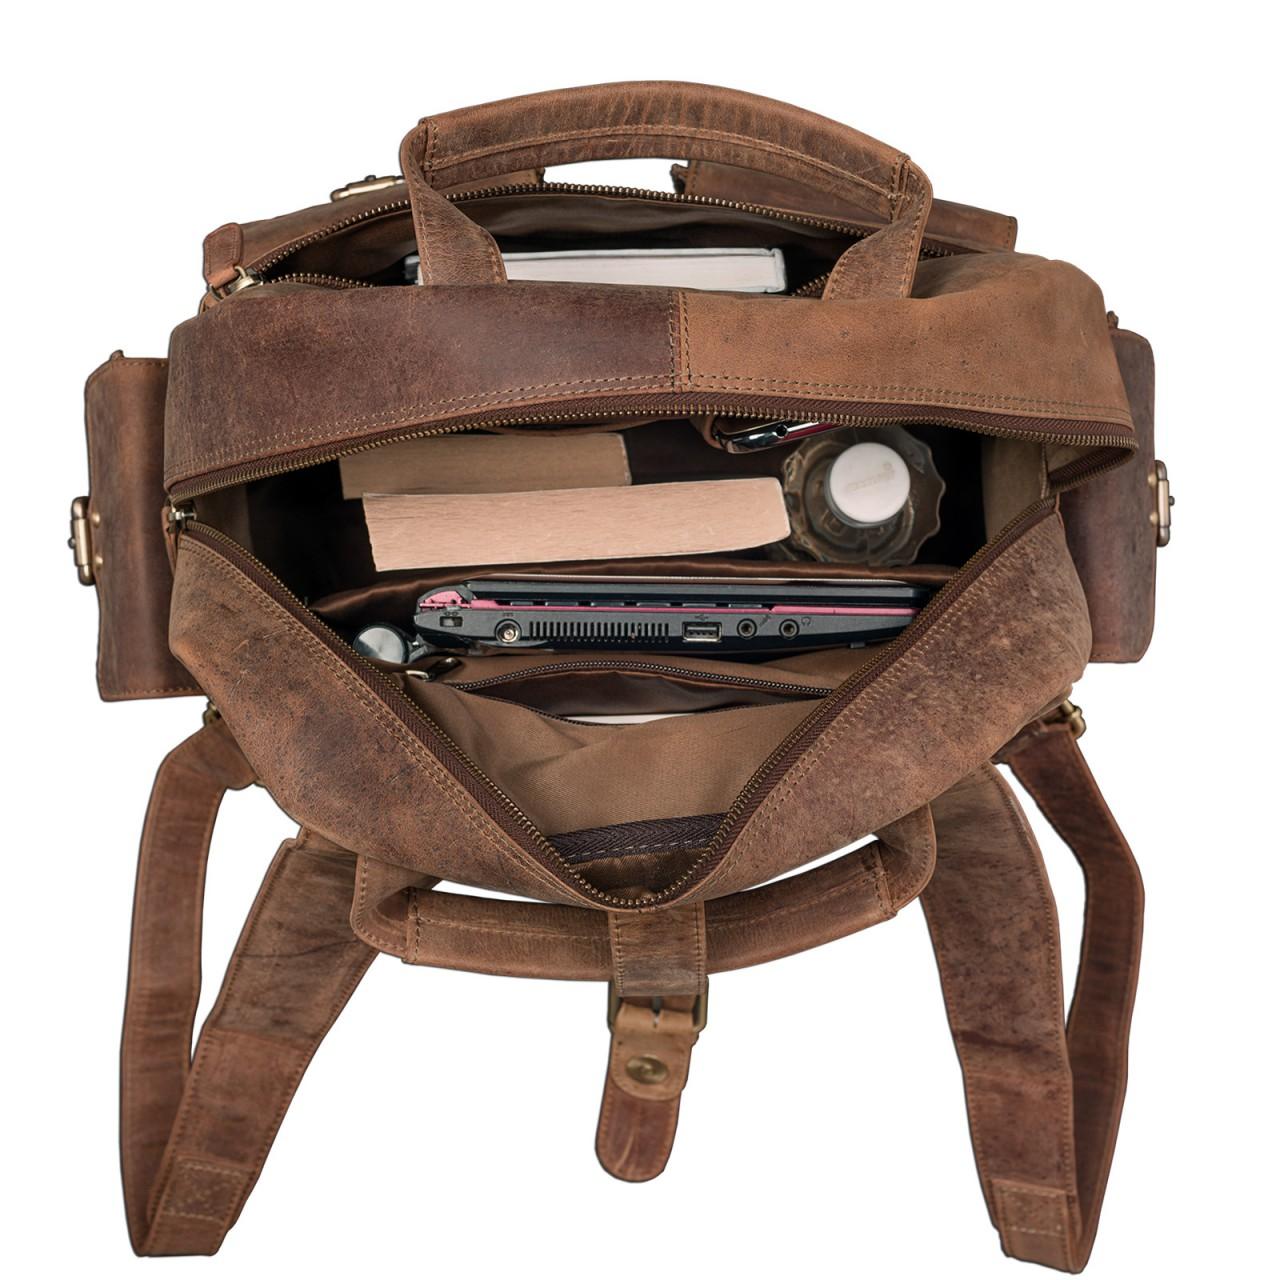 "STILORD ""Nevada"" Rucksack Leder groß im Vintage Design mit 13,3 Zoll Laptopfach Unisex Lederrucksack Uni Schule Lehrer Echtleder  - Bild 6"